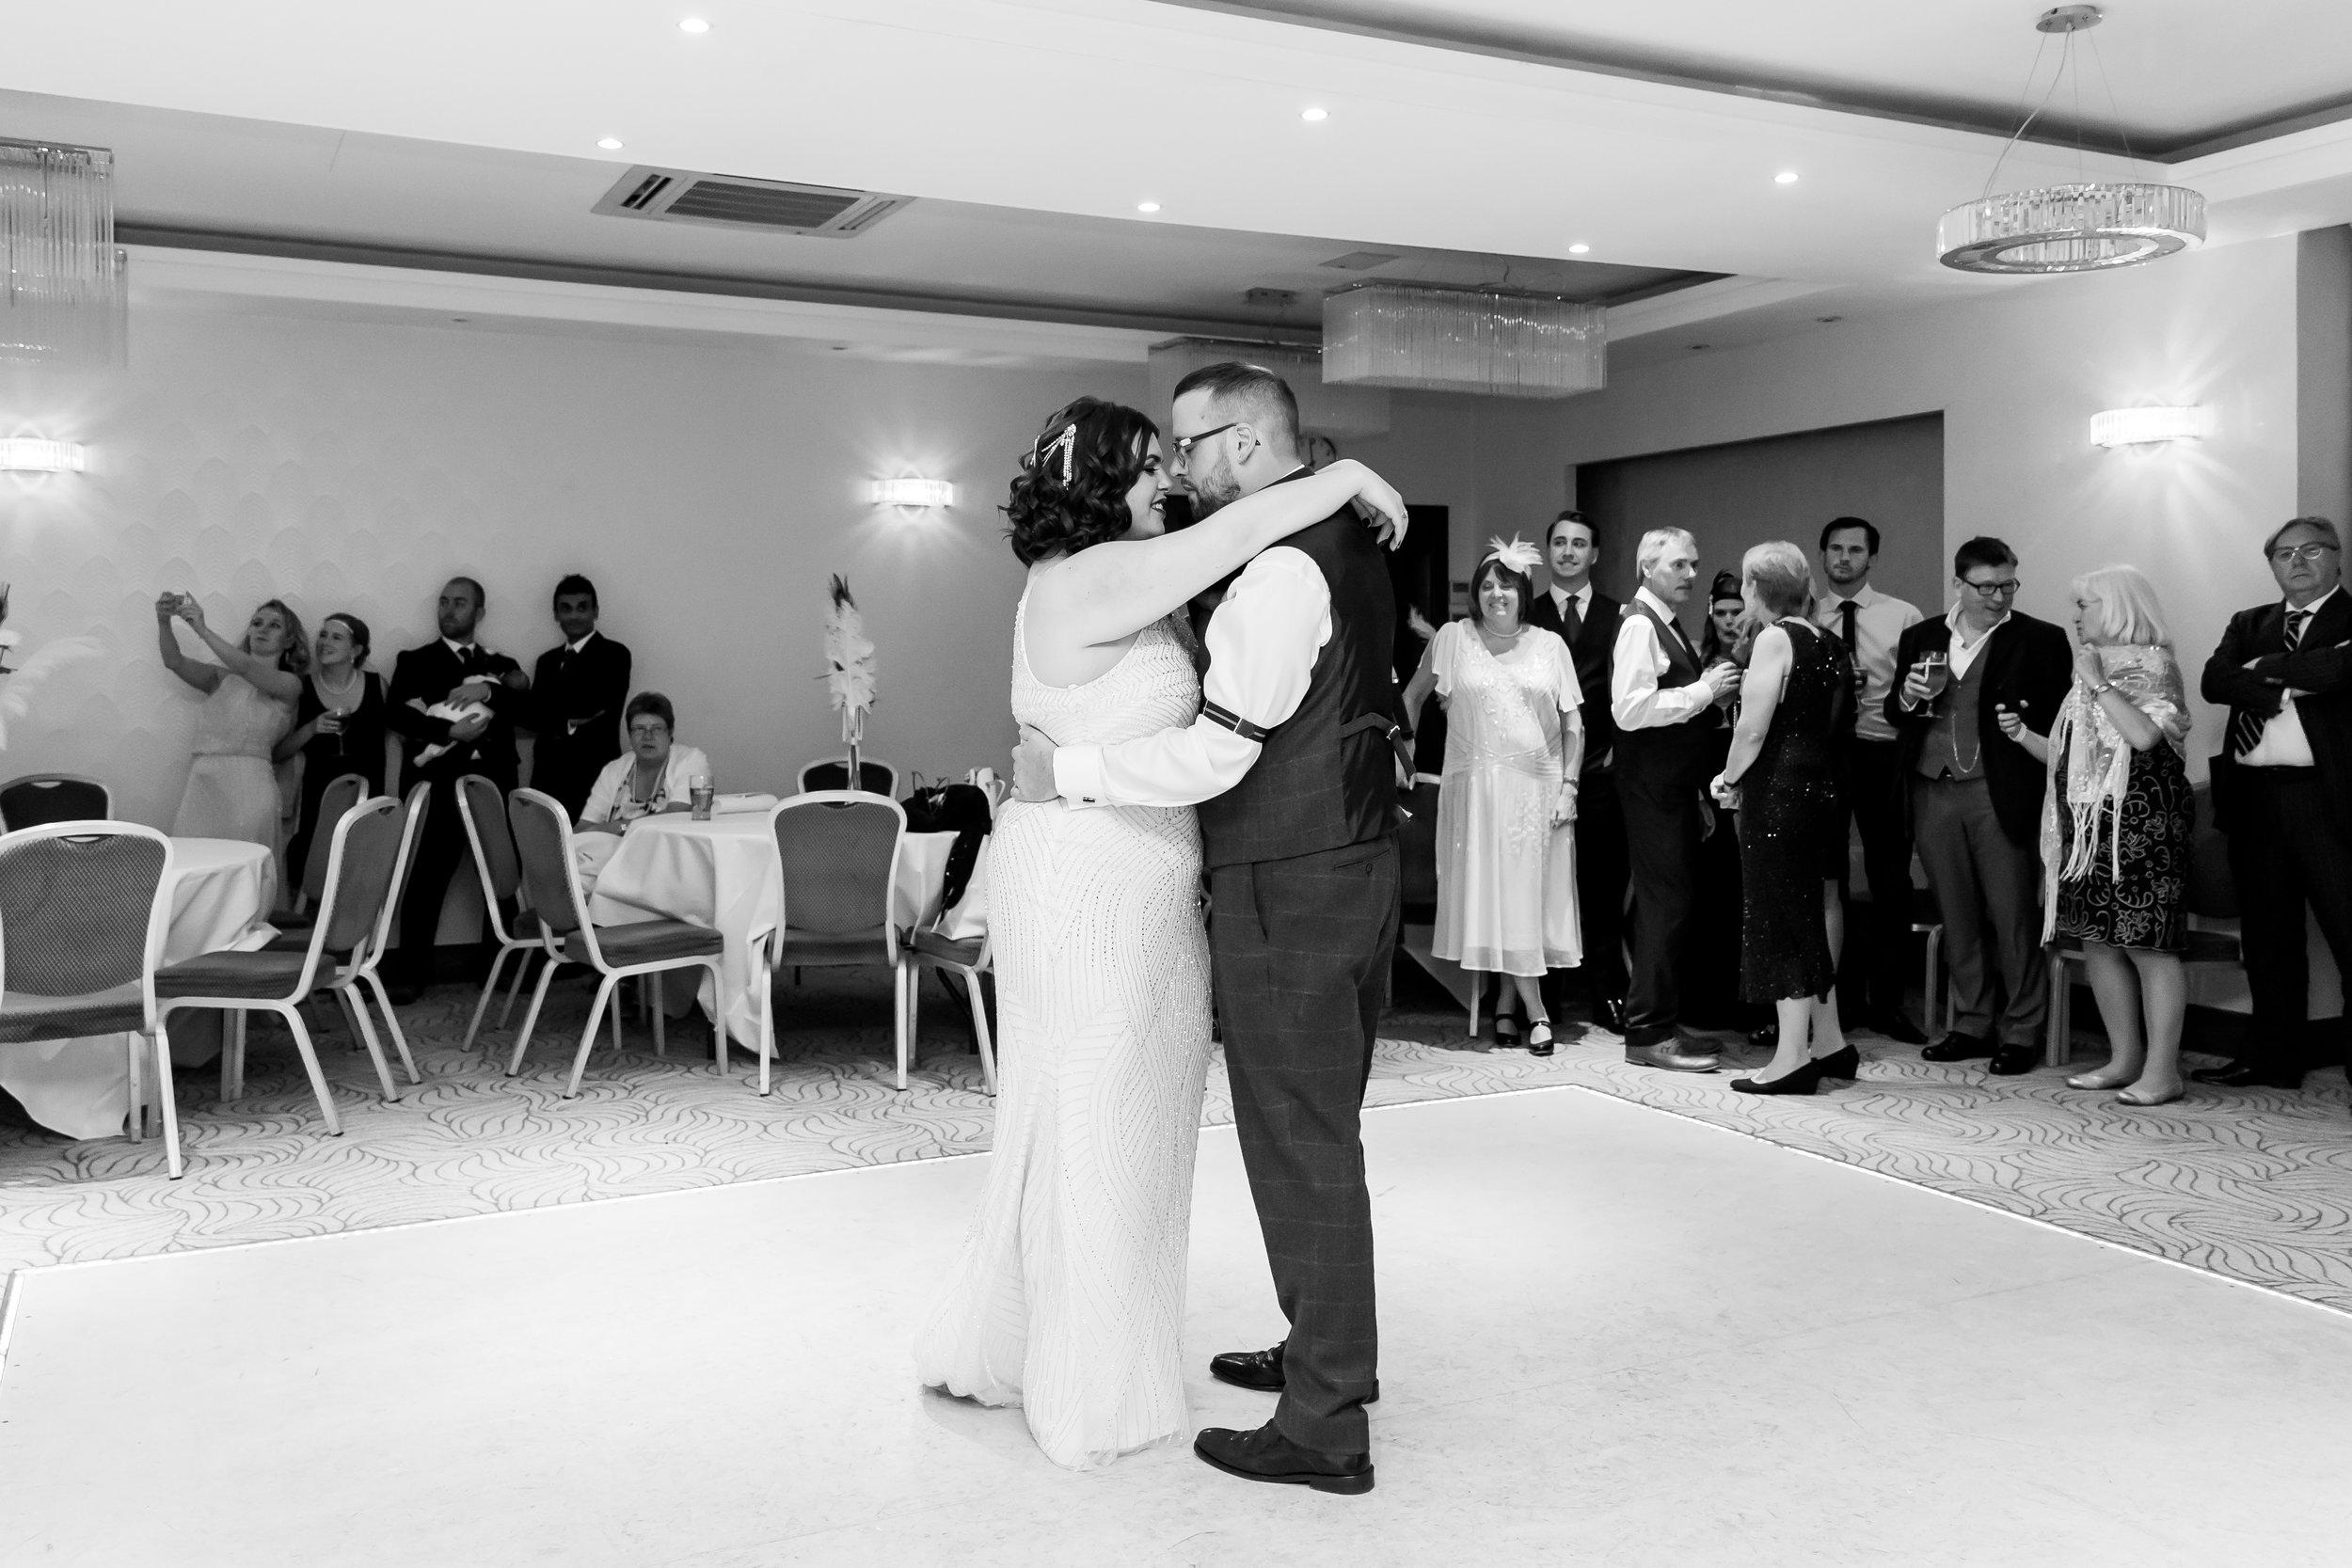 1920's wedding the first dance.jpg